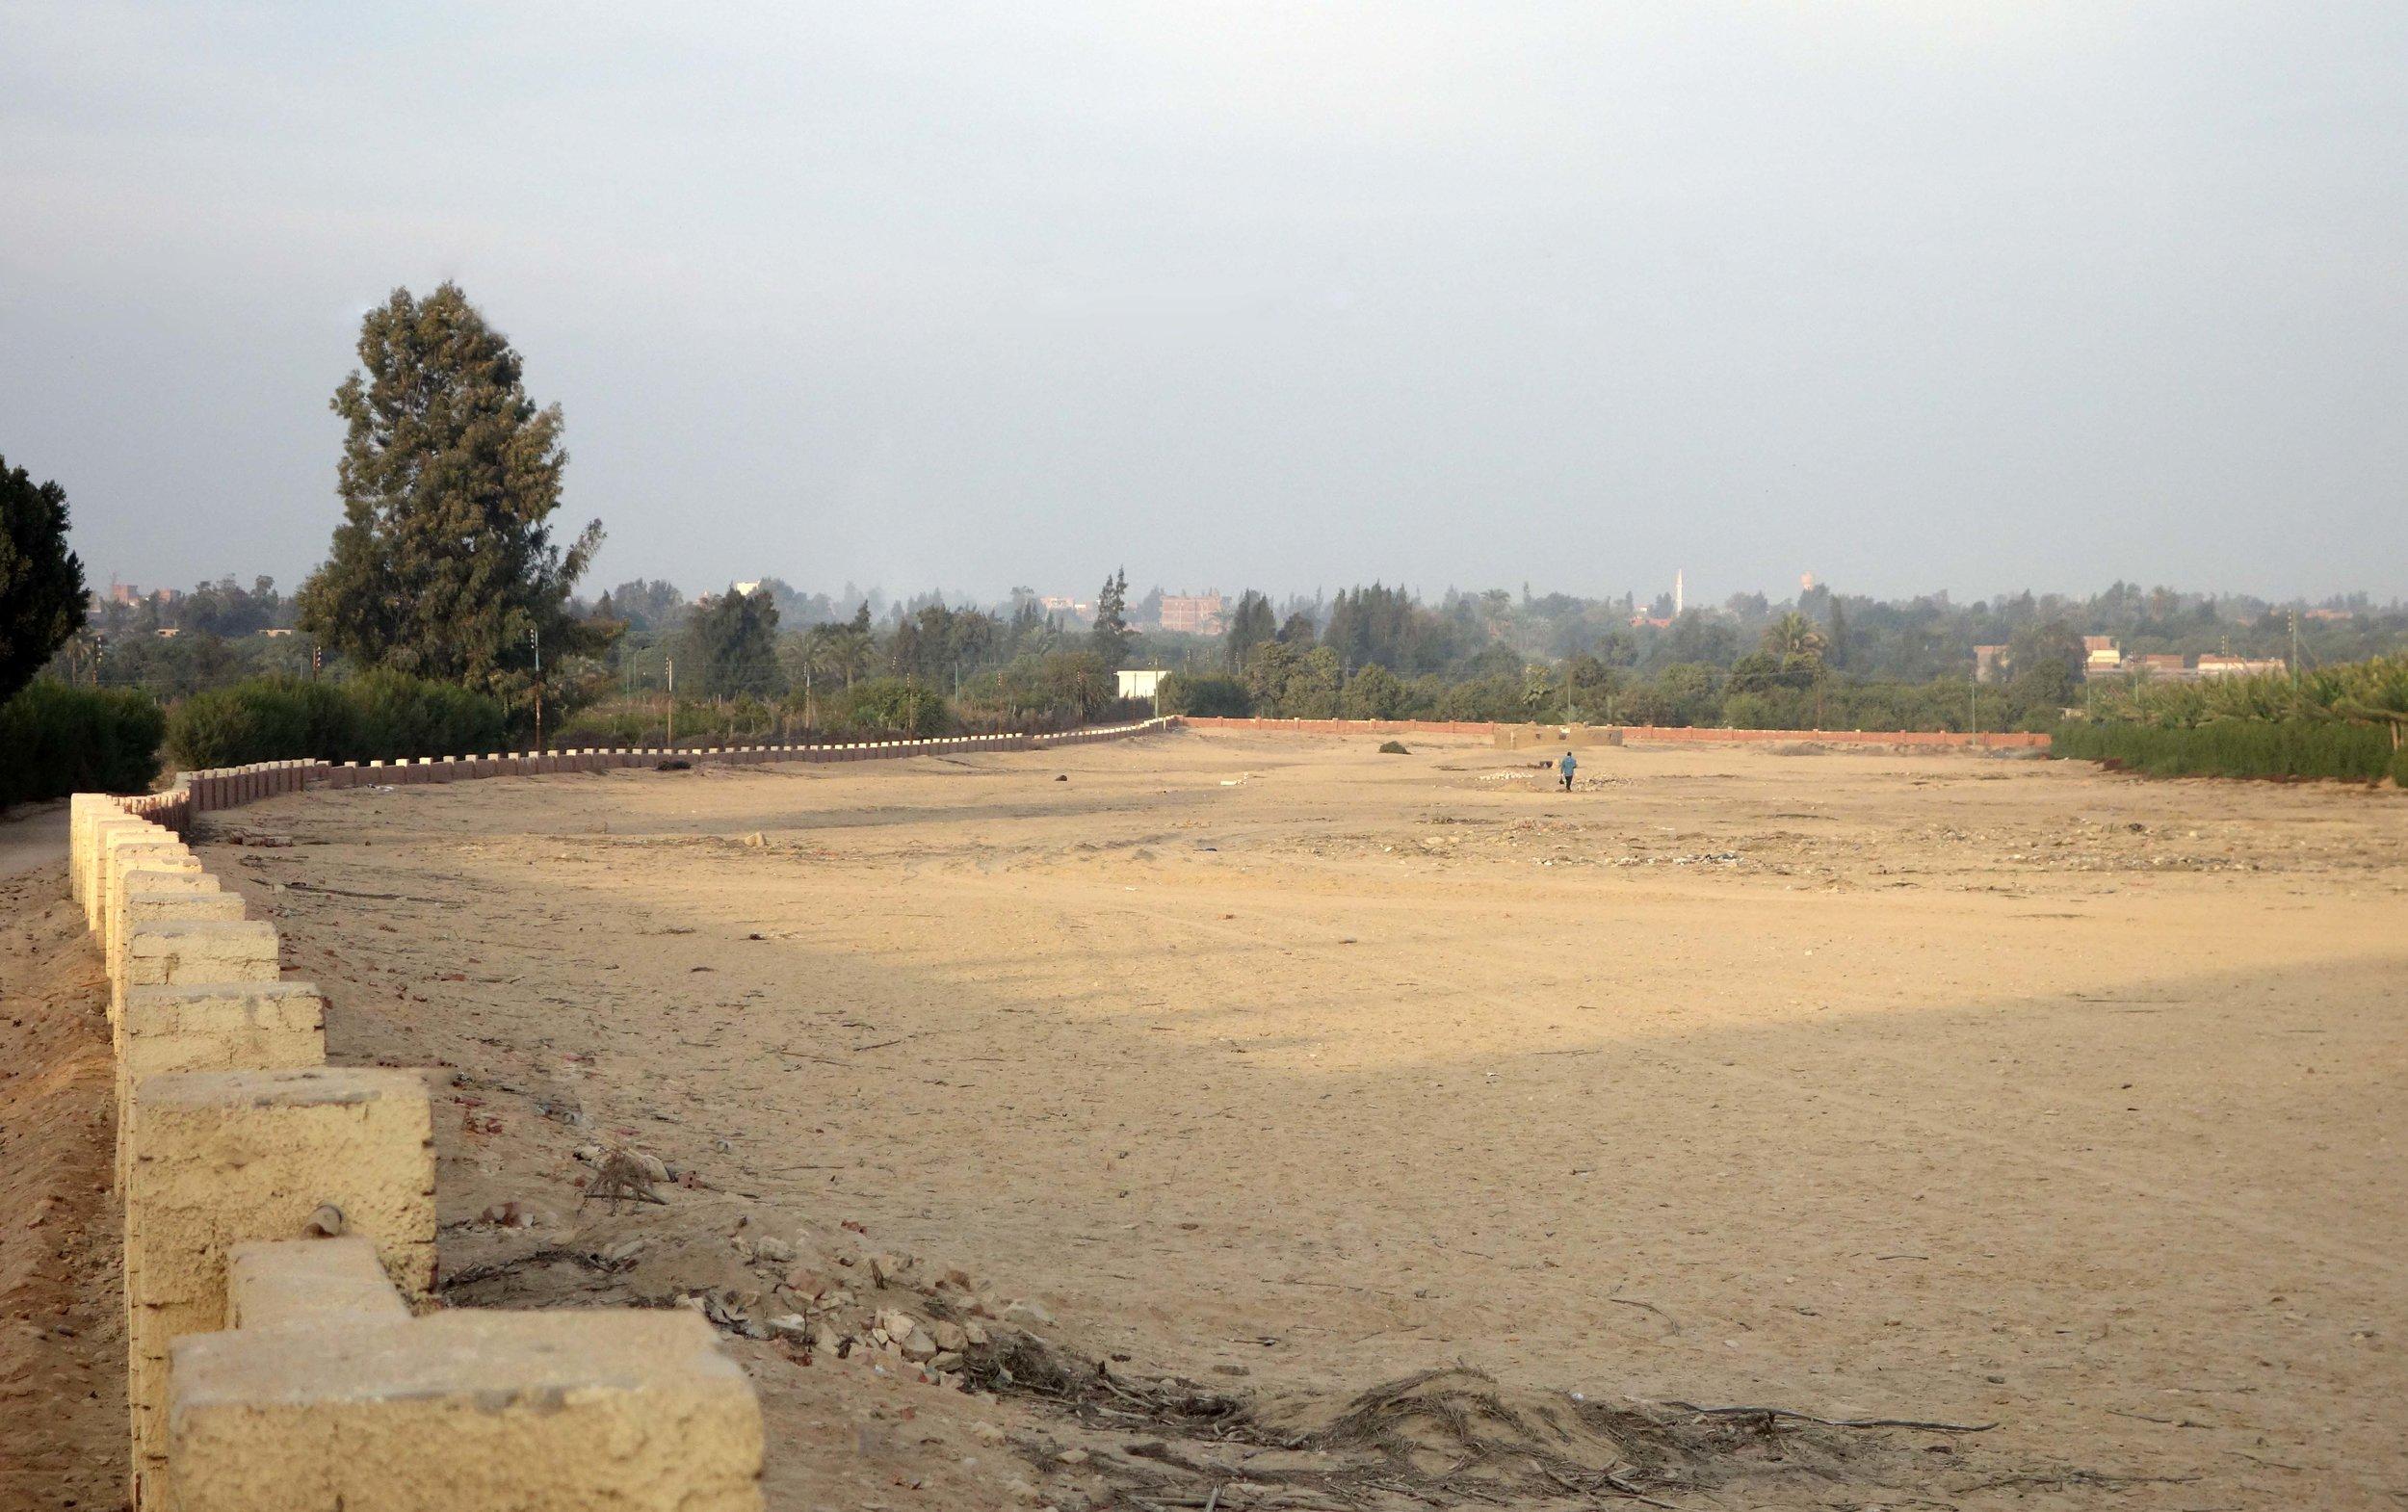 Merimde Beni Salama. View of the site (photo: Giulio Lucarini; ©Egypt Exploration Society)